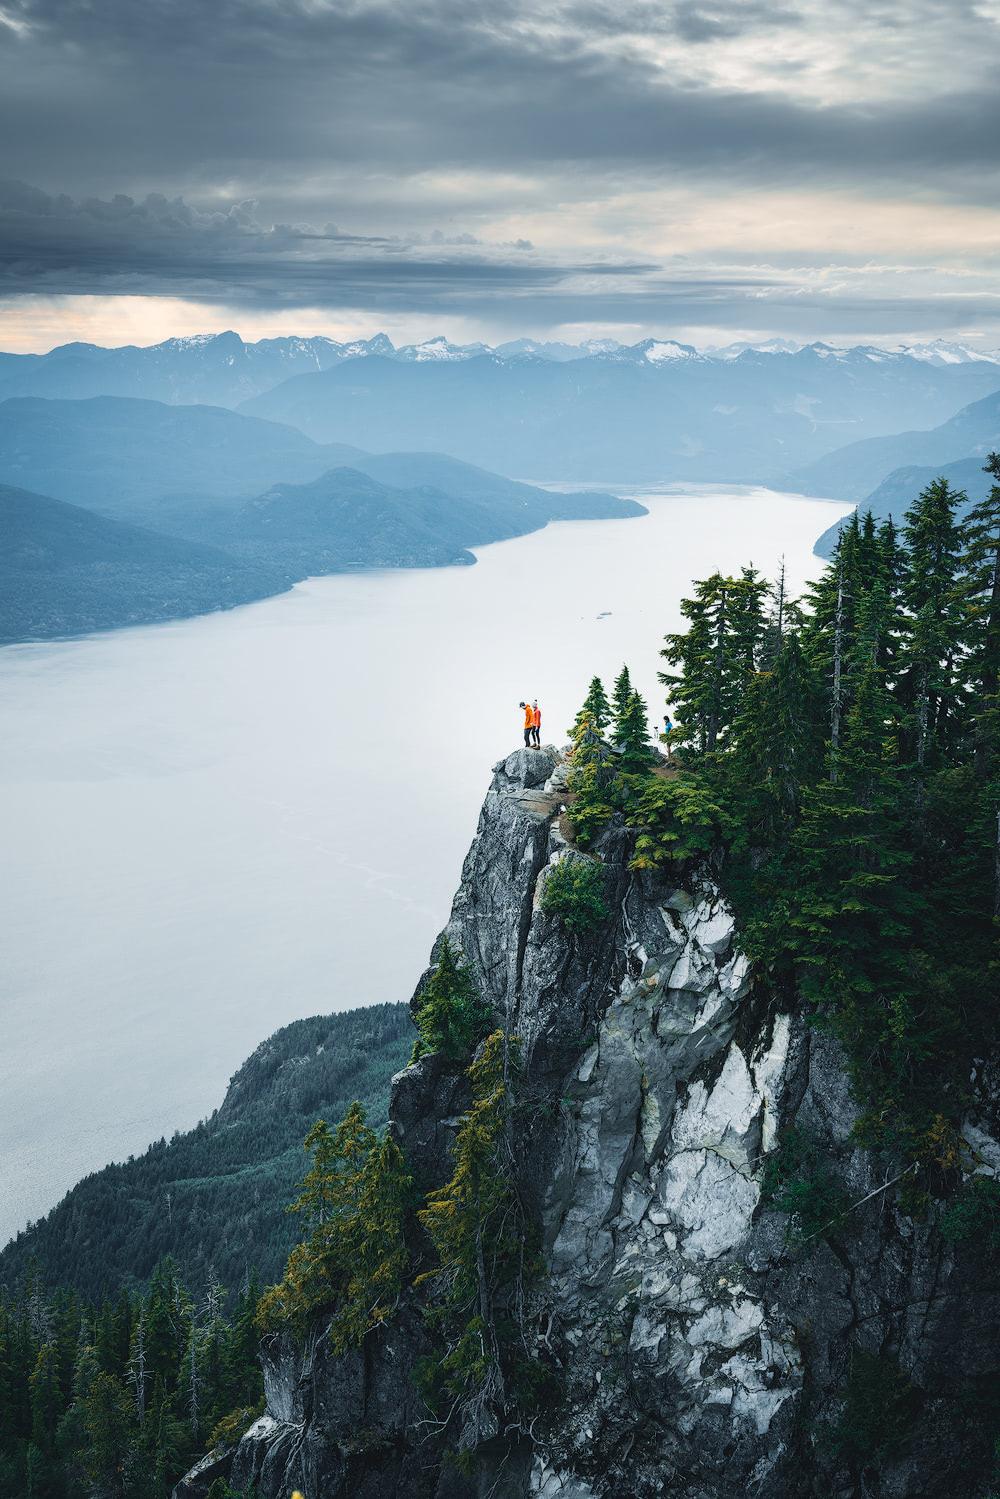 Couples Adventure Getaway to British ColumbiaSt Marks Summit Vancouver 4